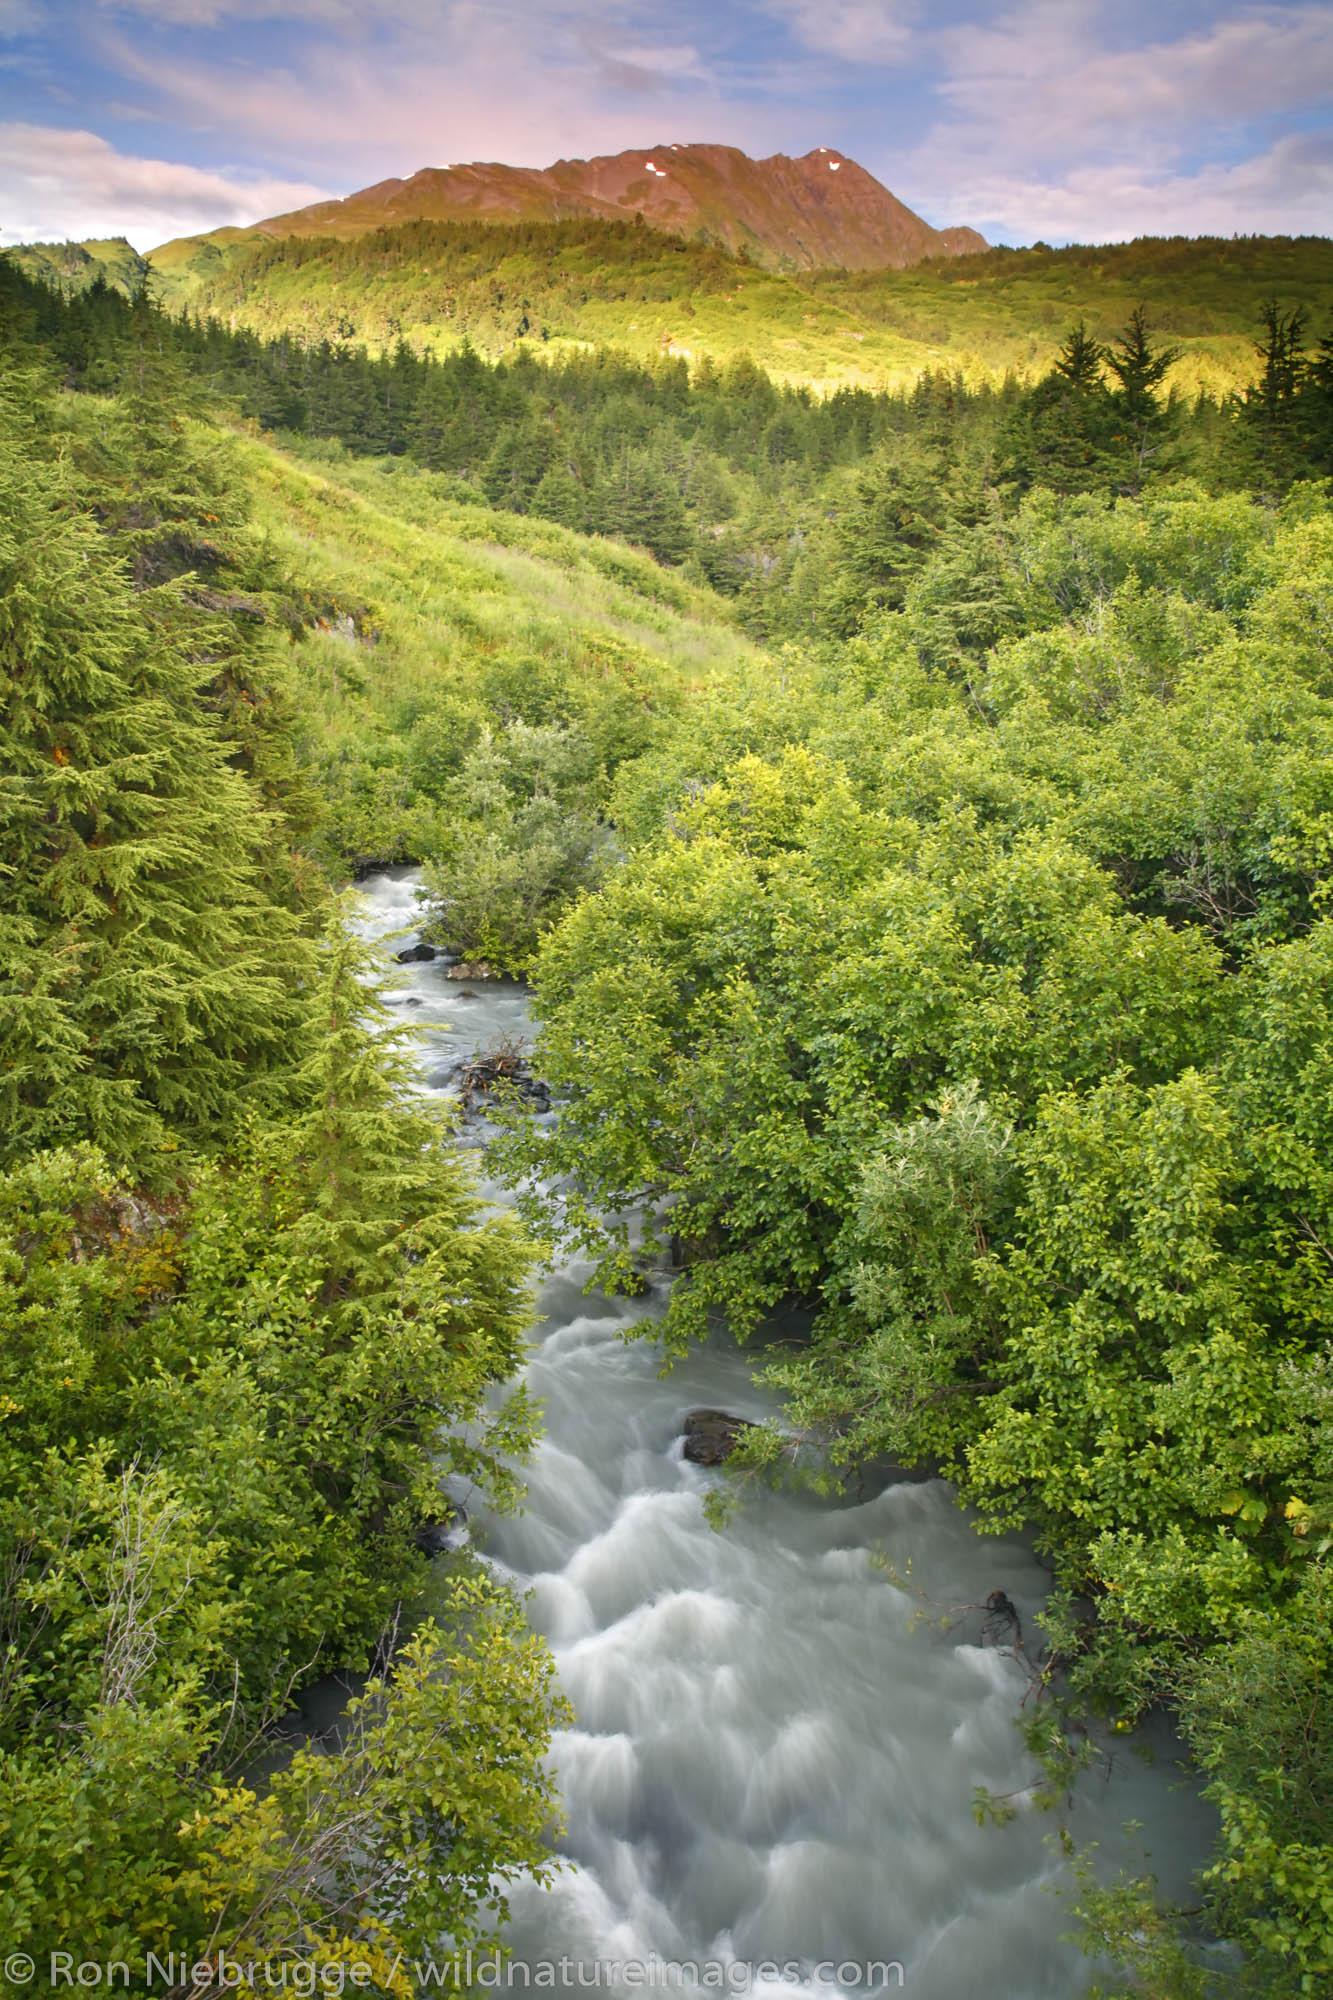 A stream in Turnagain Pass, Chugach National Forest, Alaska.